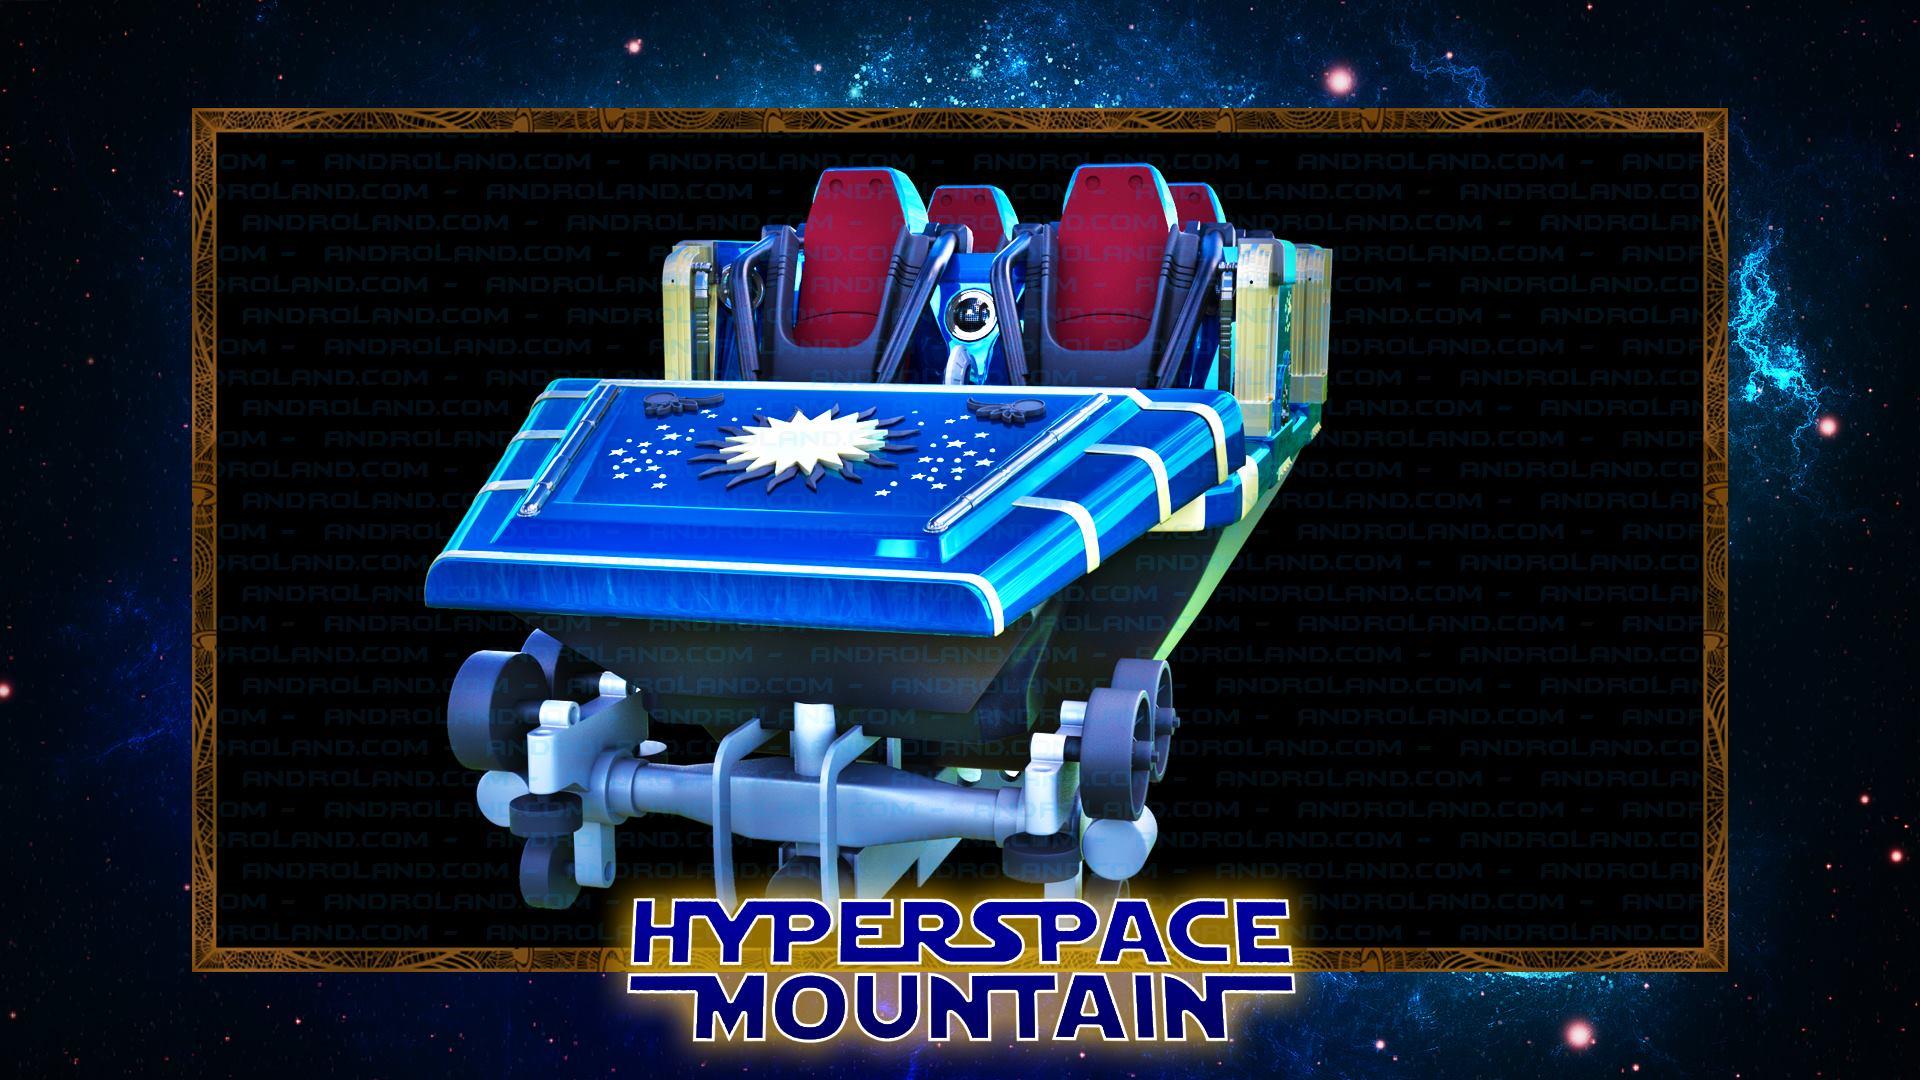 [Nouveau] Star Wars Hyperspace Mountain (mai 2017) - Page 40 HSM_3D_01